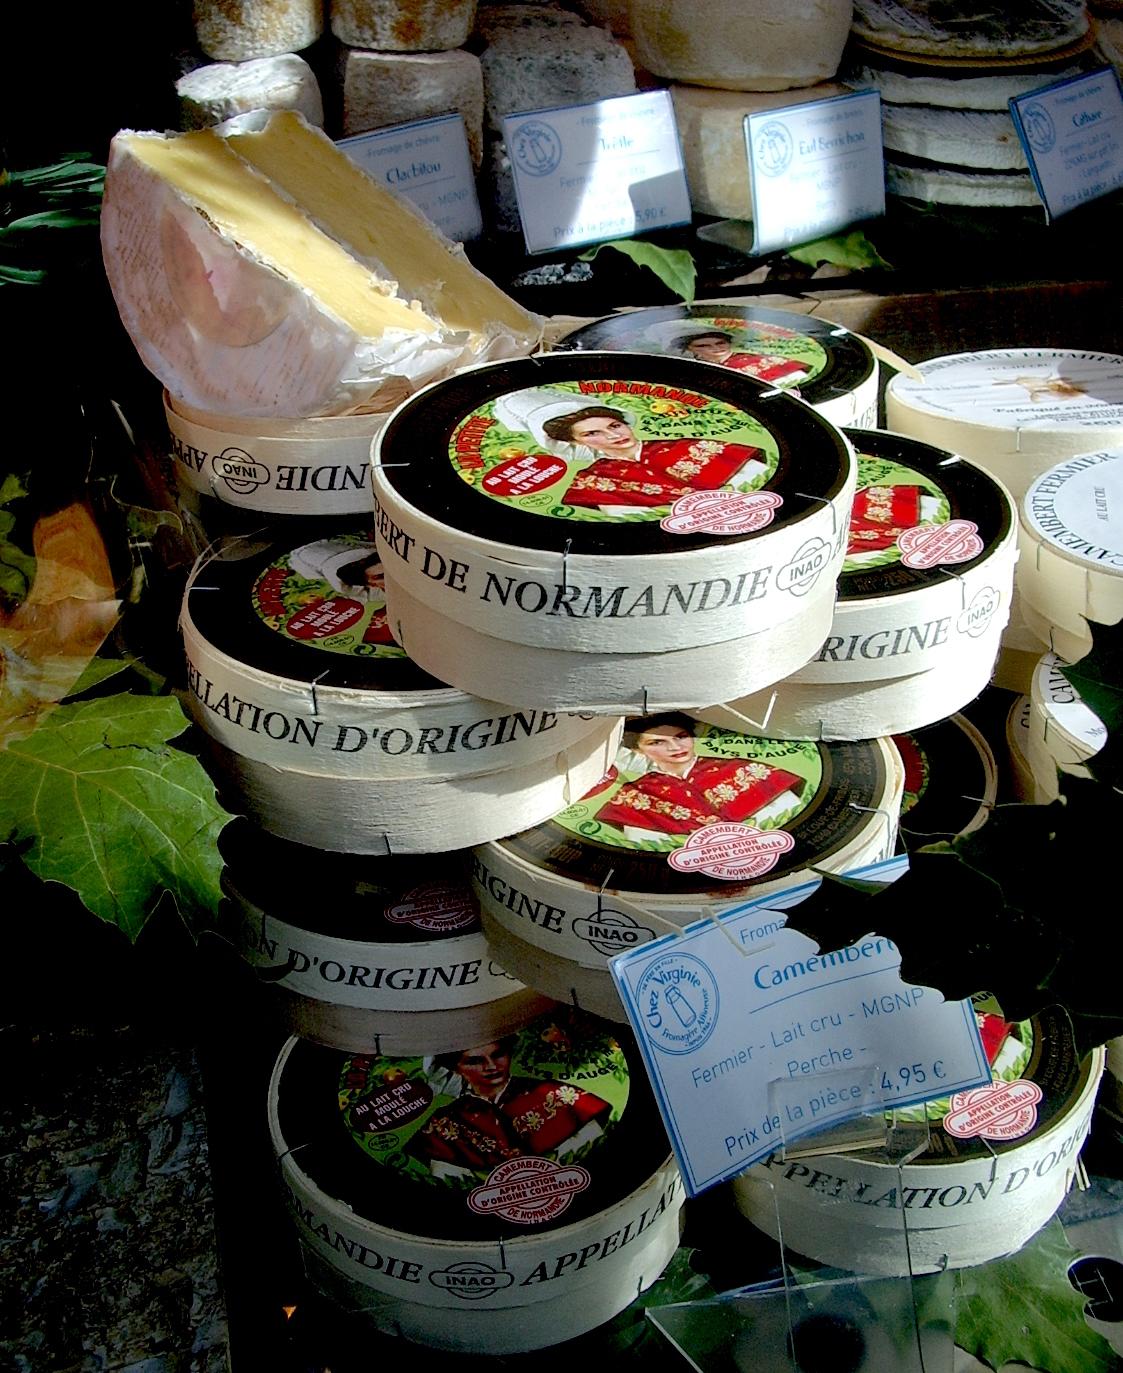 Camembert de Normandie (c) Jennifer CC BY-NC-ND 2.0